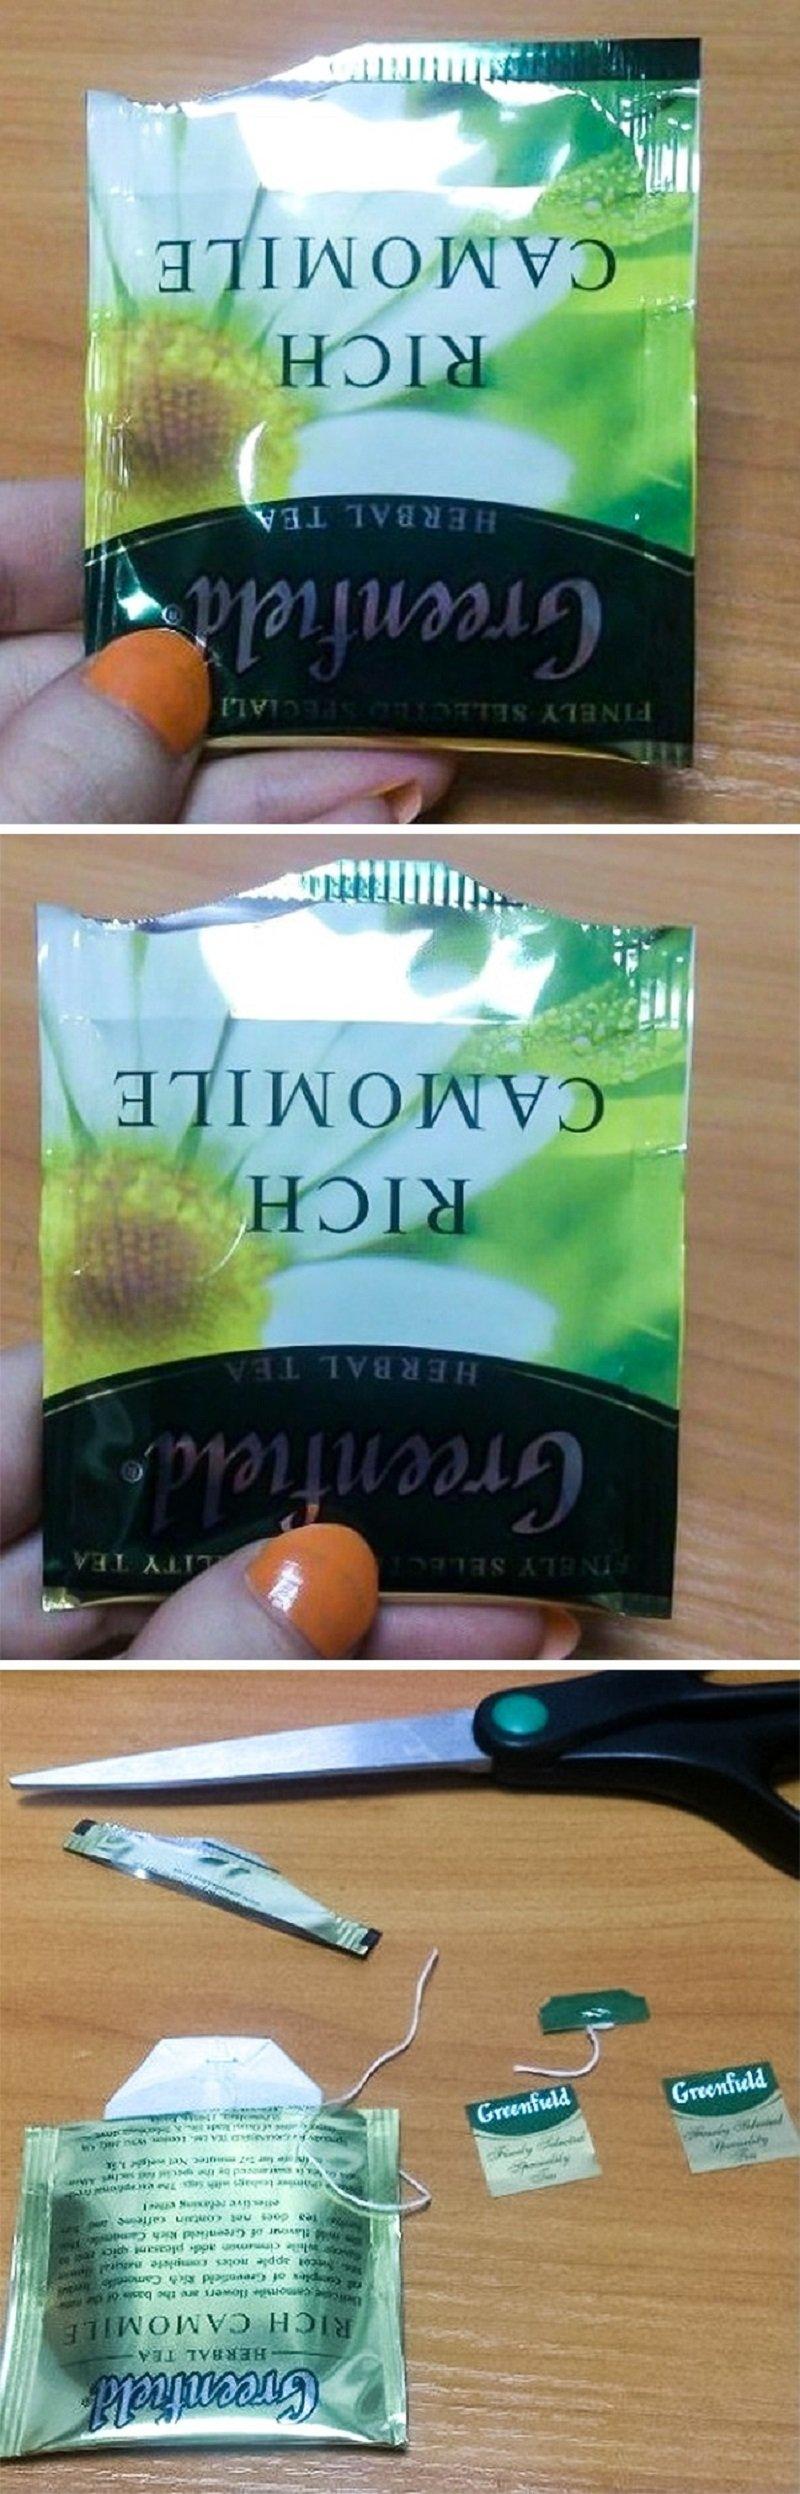 torebce z herbatą